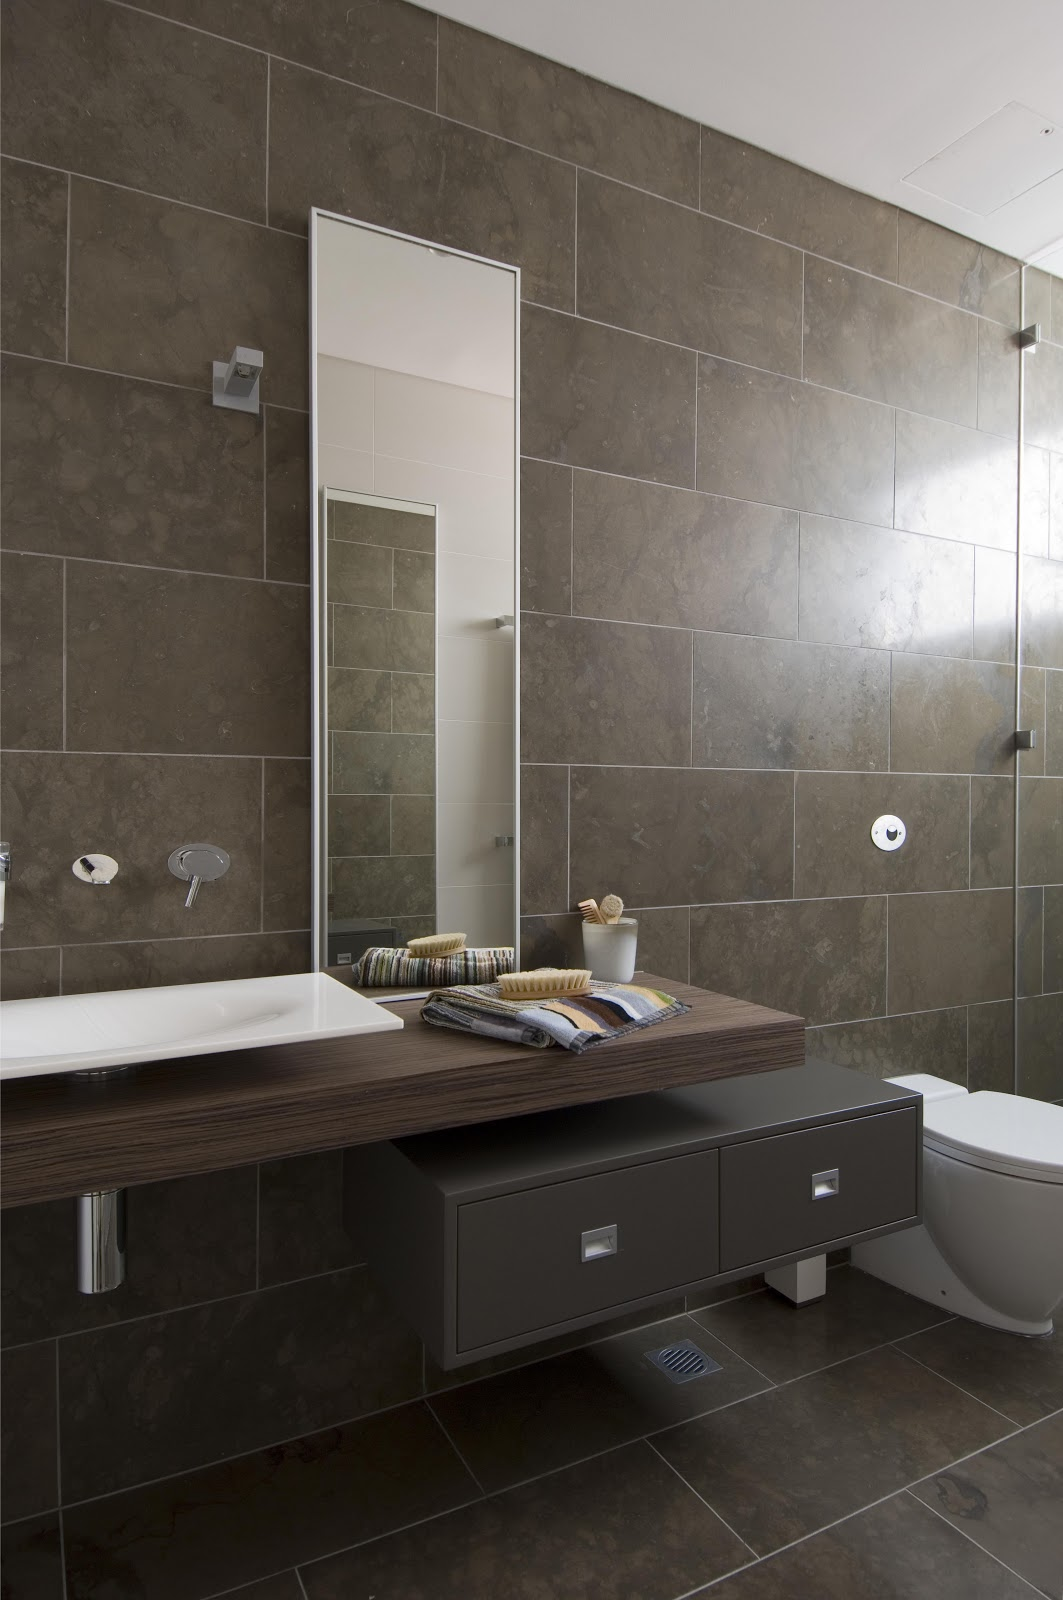 minosa sensory interior delight by minosa. Black Bedroom Furniture Sets. Home Design Ideas